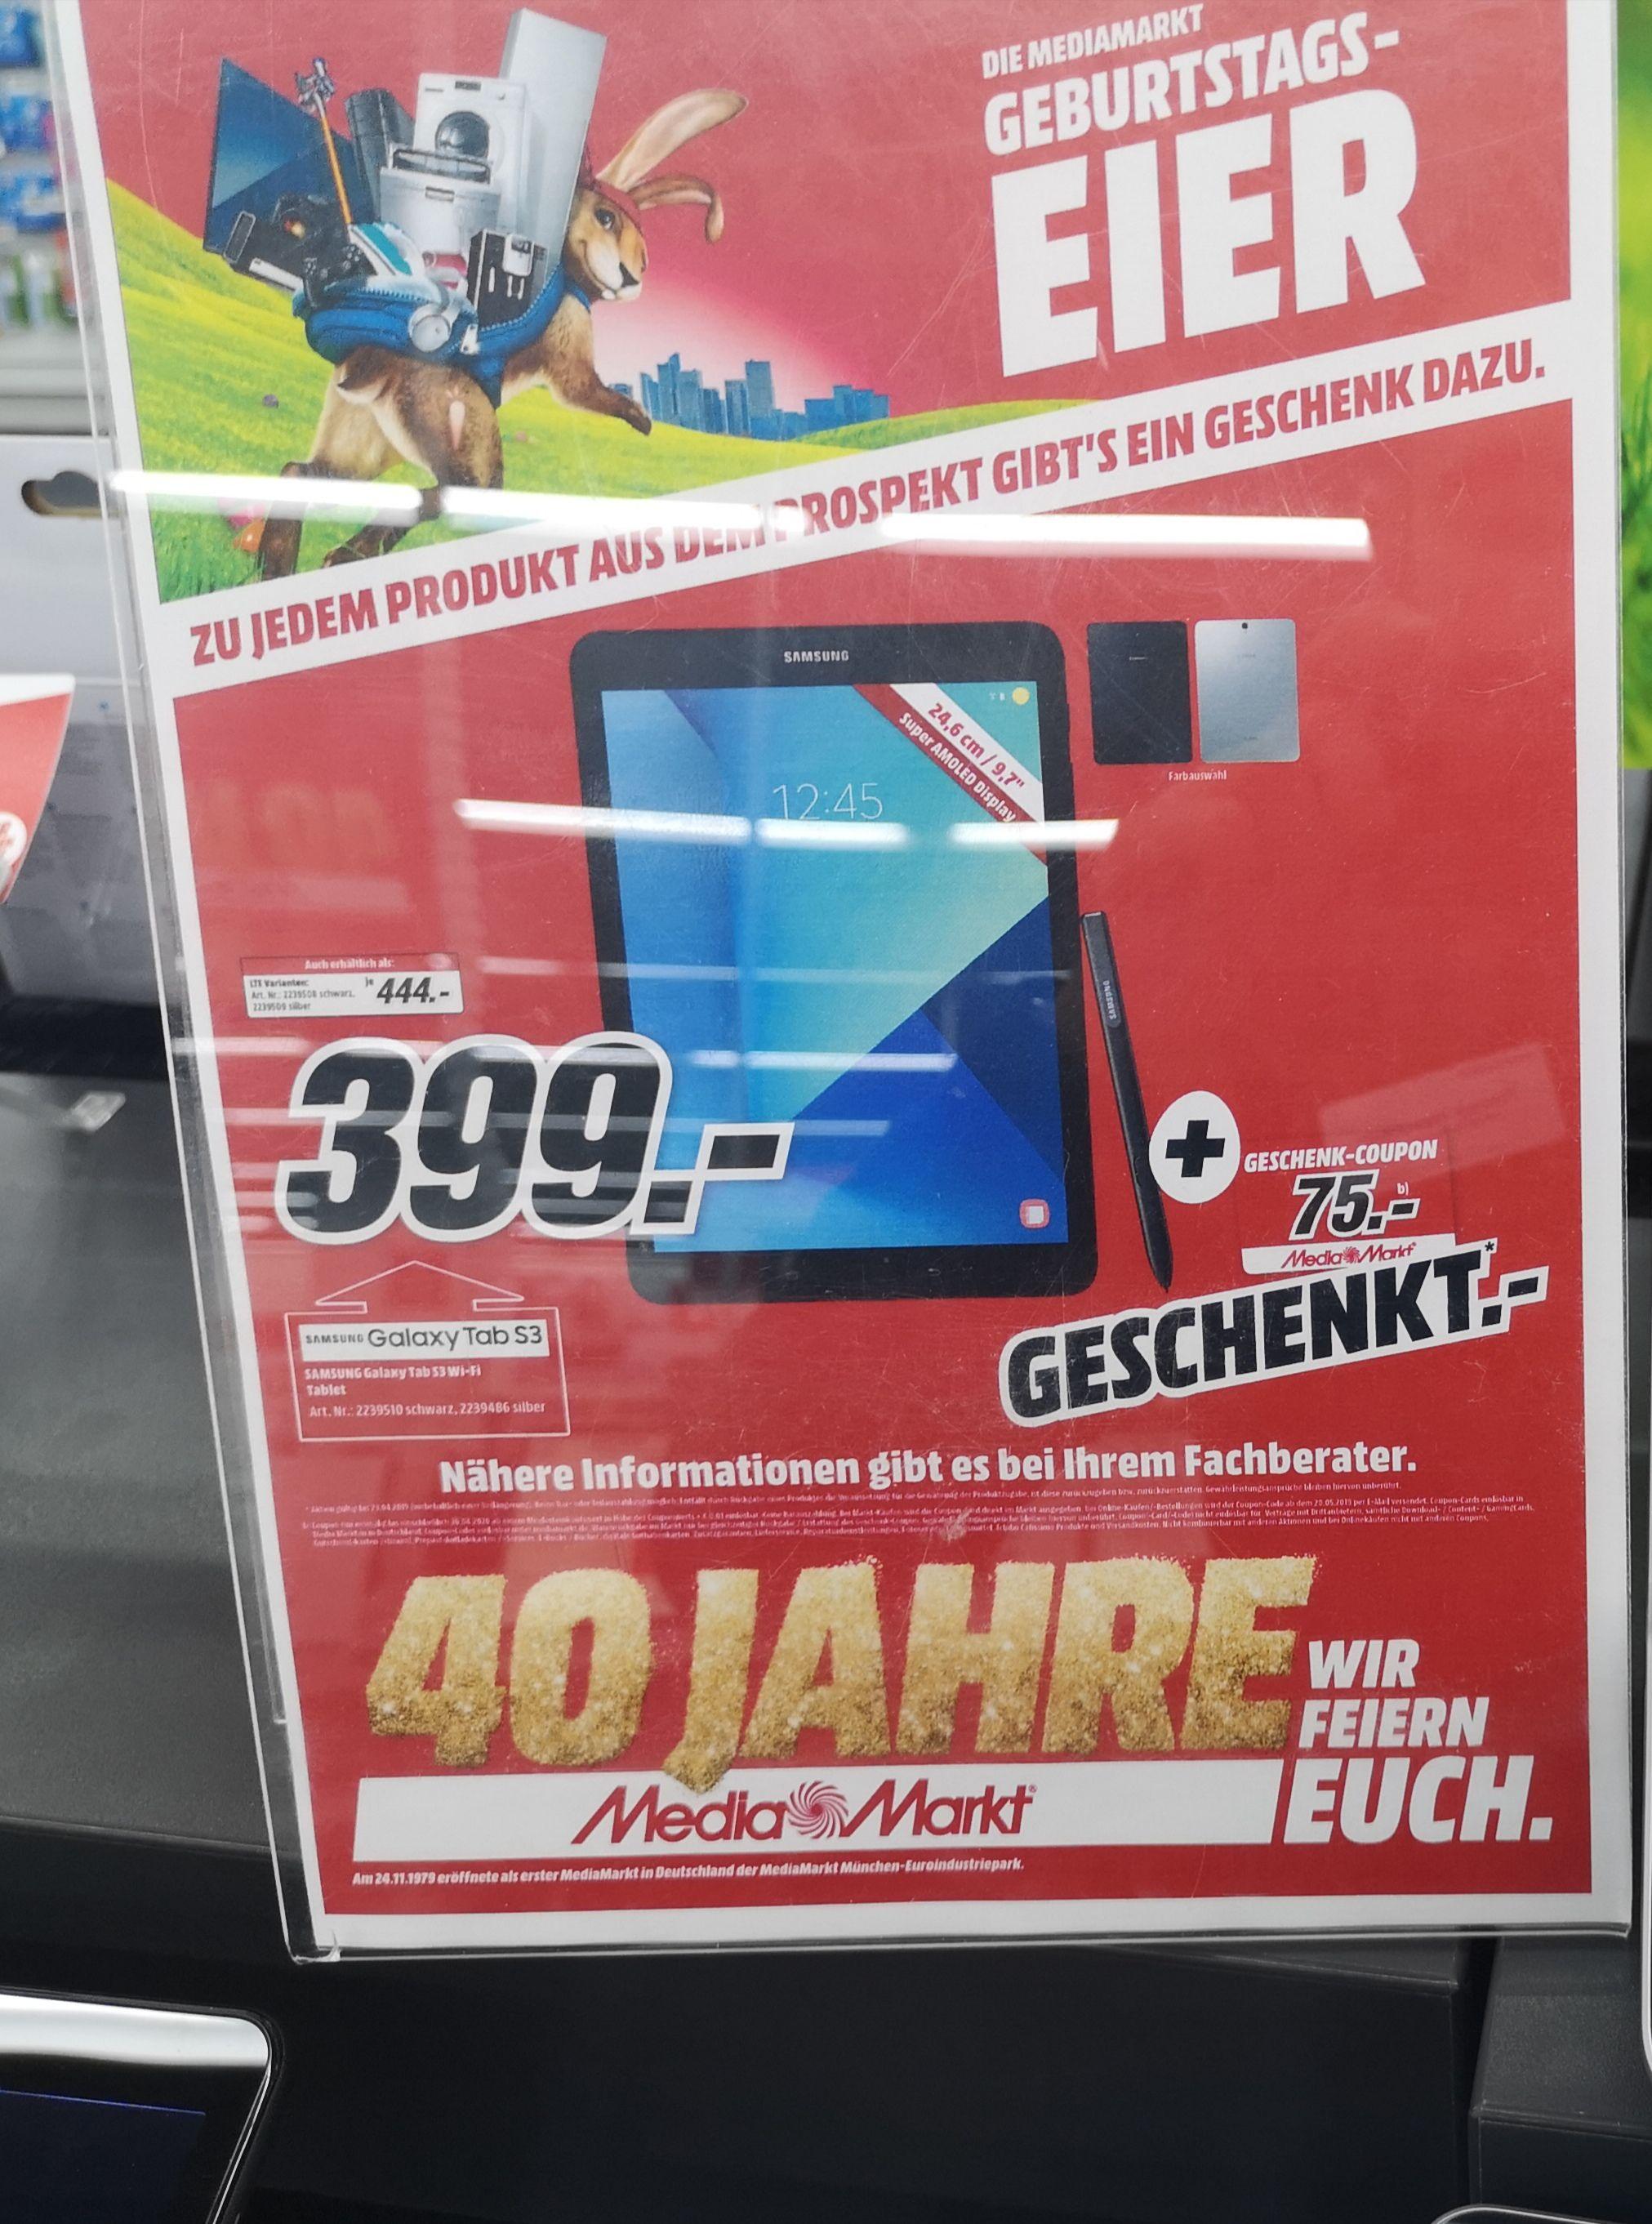 Samsung Tab S3 WiFi Variante mit 75€-Coupon